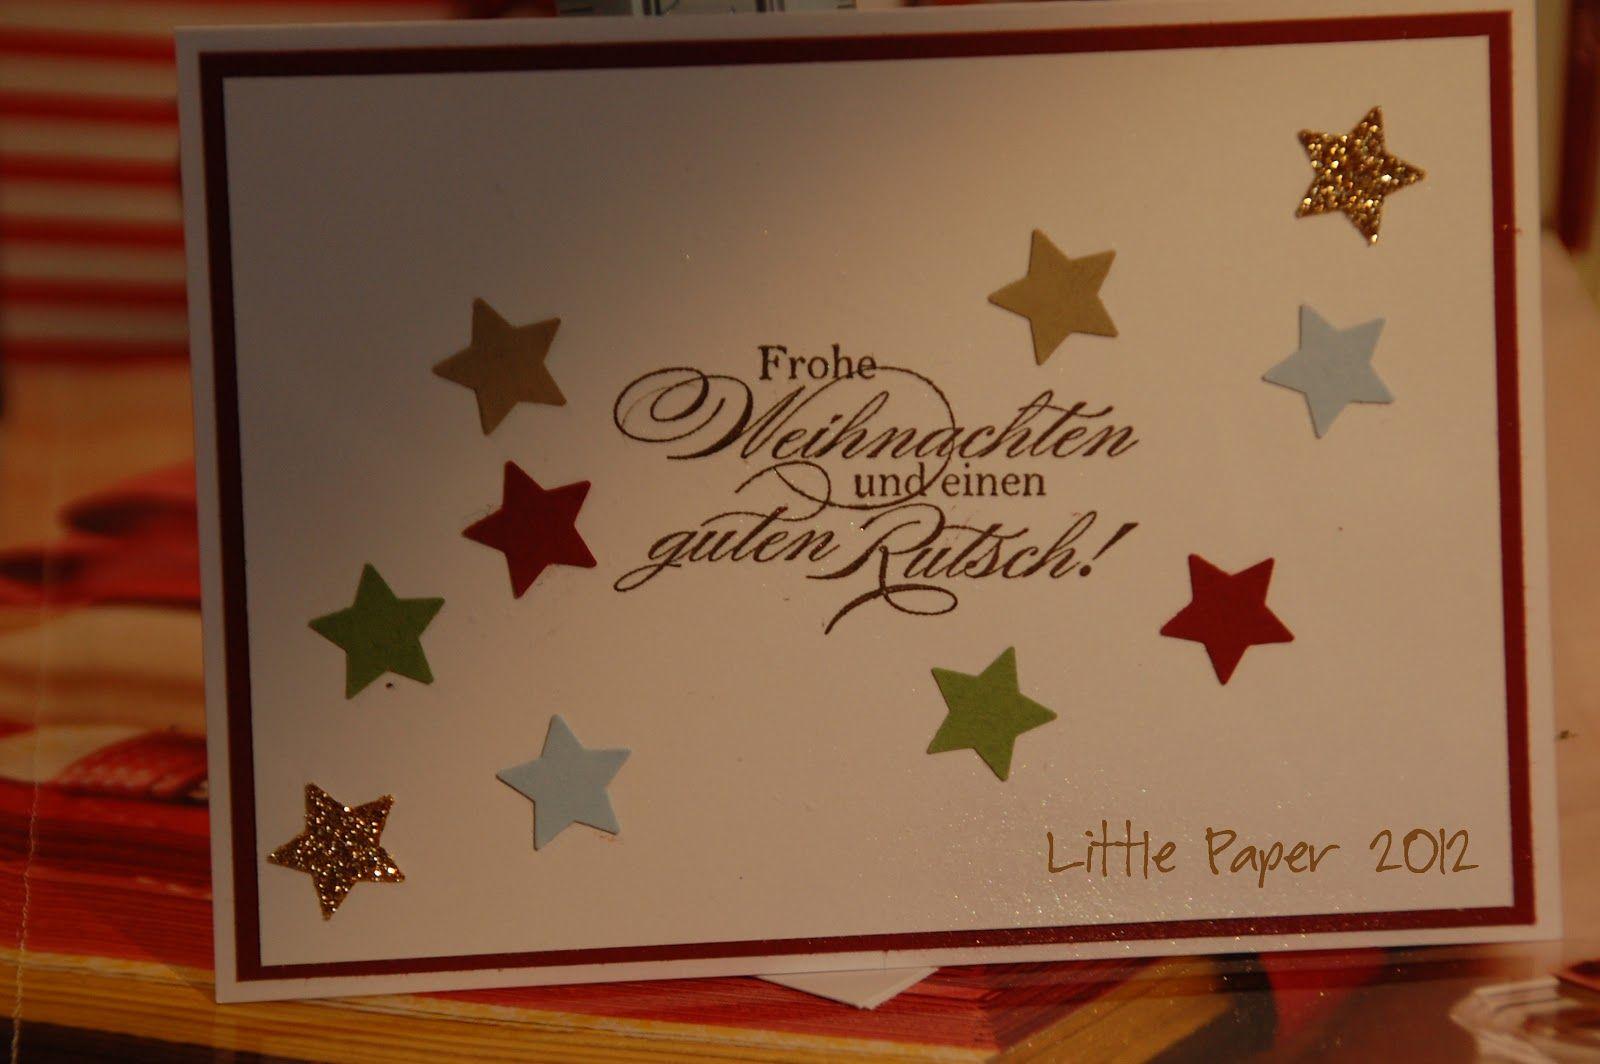 Little Paper